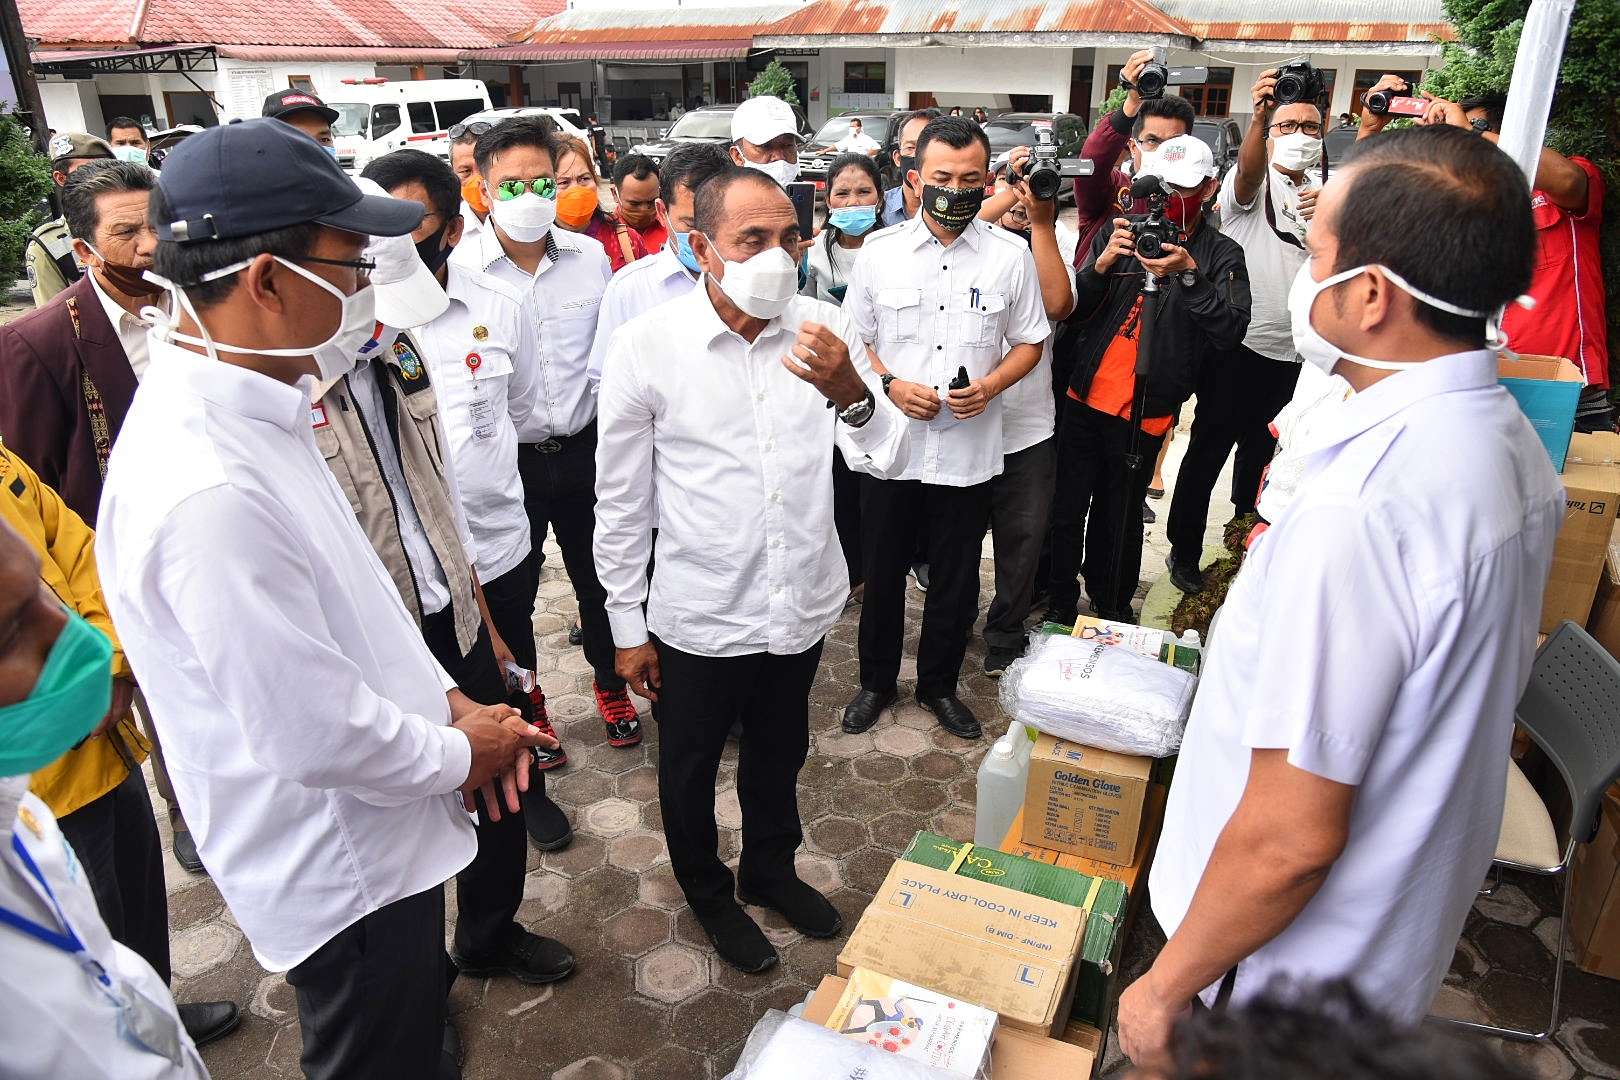 Gubernur Sumatera Utara Edy Rahmayadi menyerahkan bantuan untuk penangangan Covid - 19 beripa APD Komplit dan Hand Sanitizer di Rumah Sakit Umum Daerah Dolok Sanggul Kabupaten Humbang Hasundutan. Foto: Biro Humas dan Keprotokolan Setdaprov Sumut/ Veri Ardian